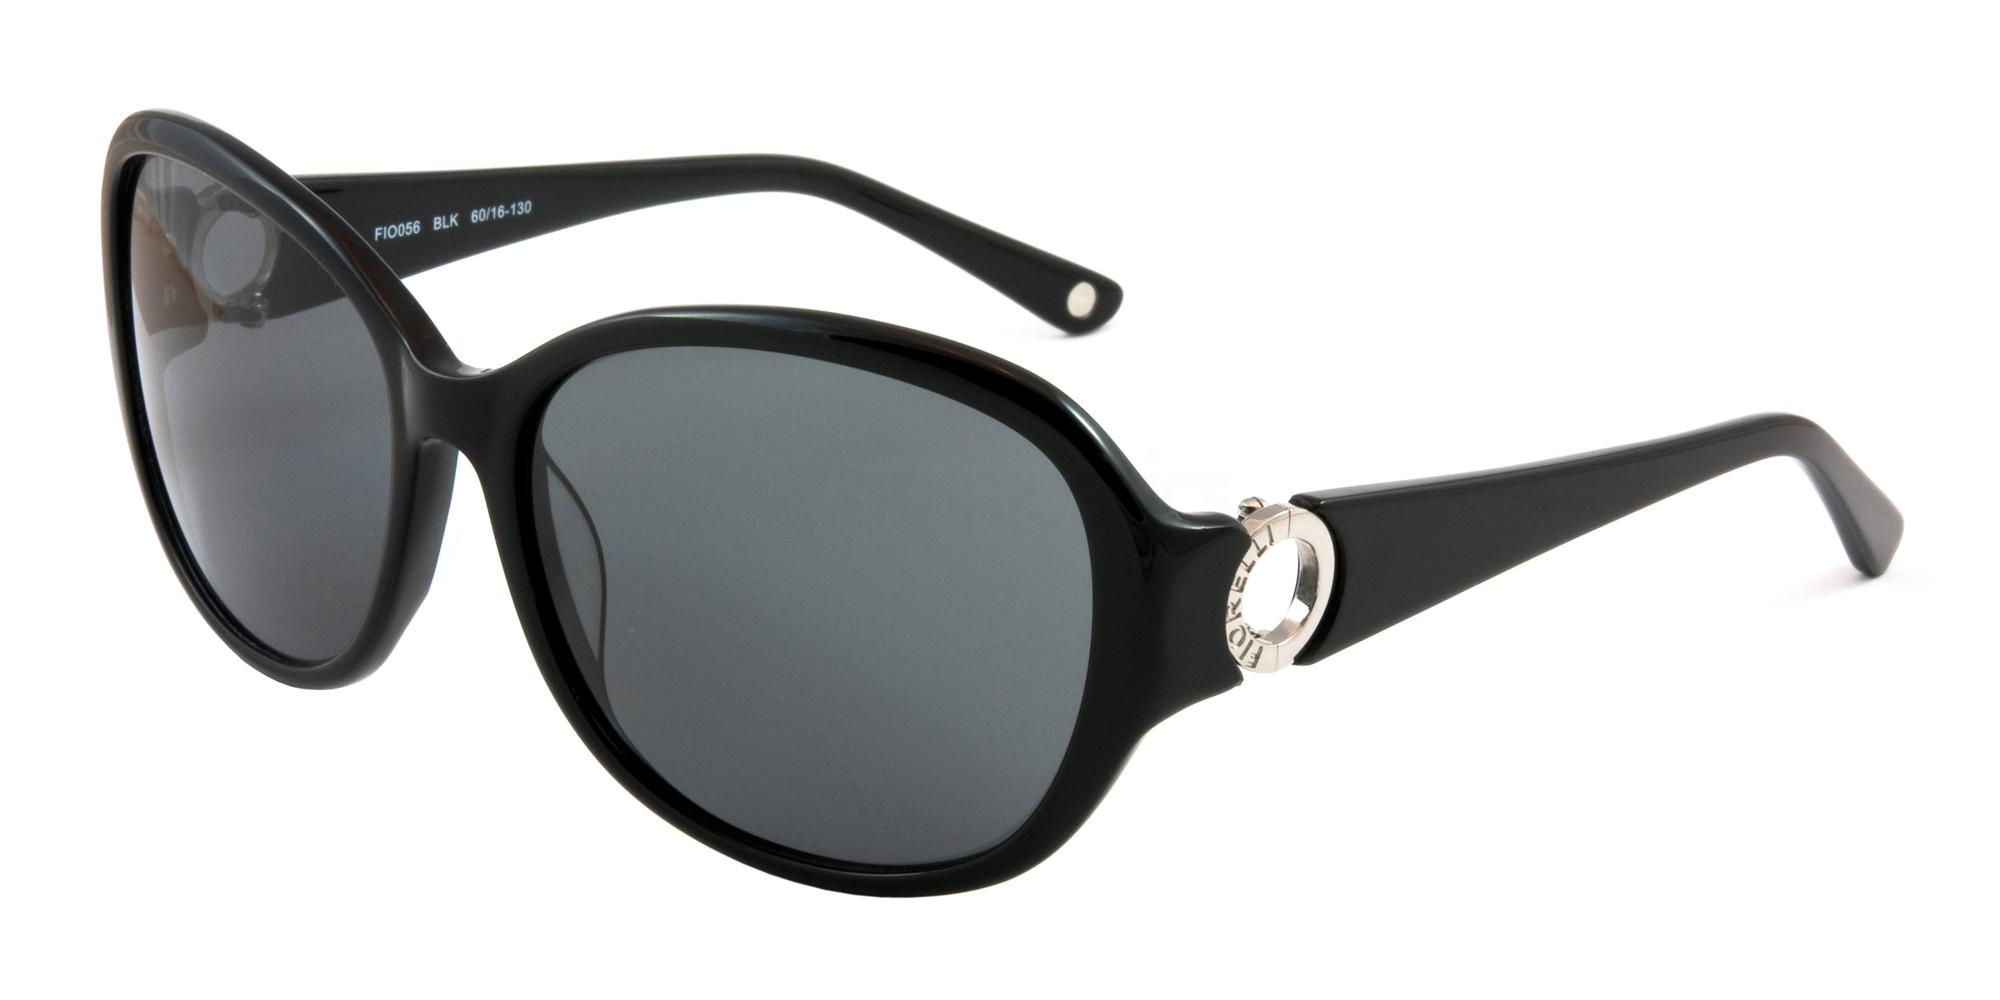 01 FIO056 Sunglasses, Fiorelli